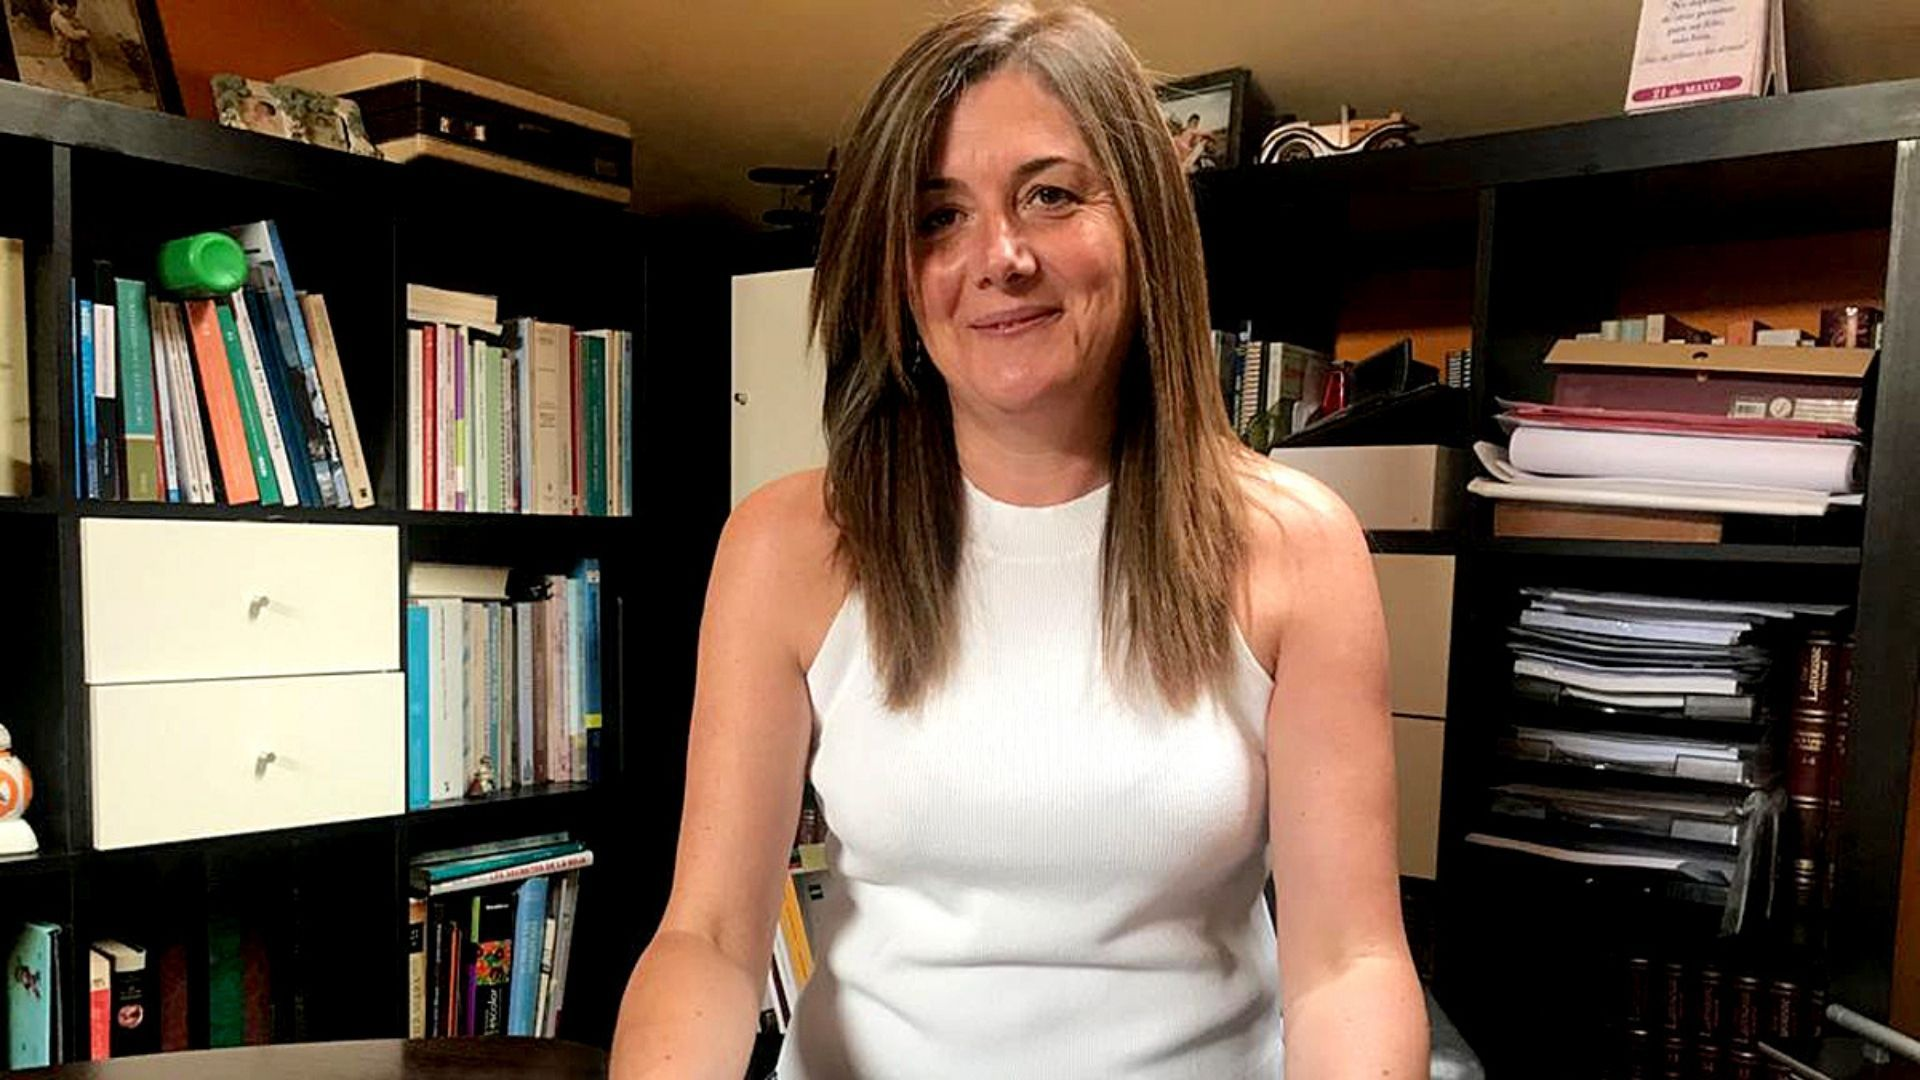 Cristina Vega Morán, nueva directora general de Planificación e Infraestructuras Educativas